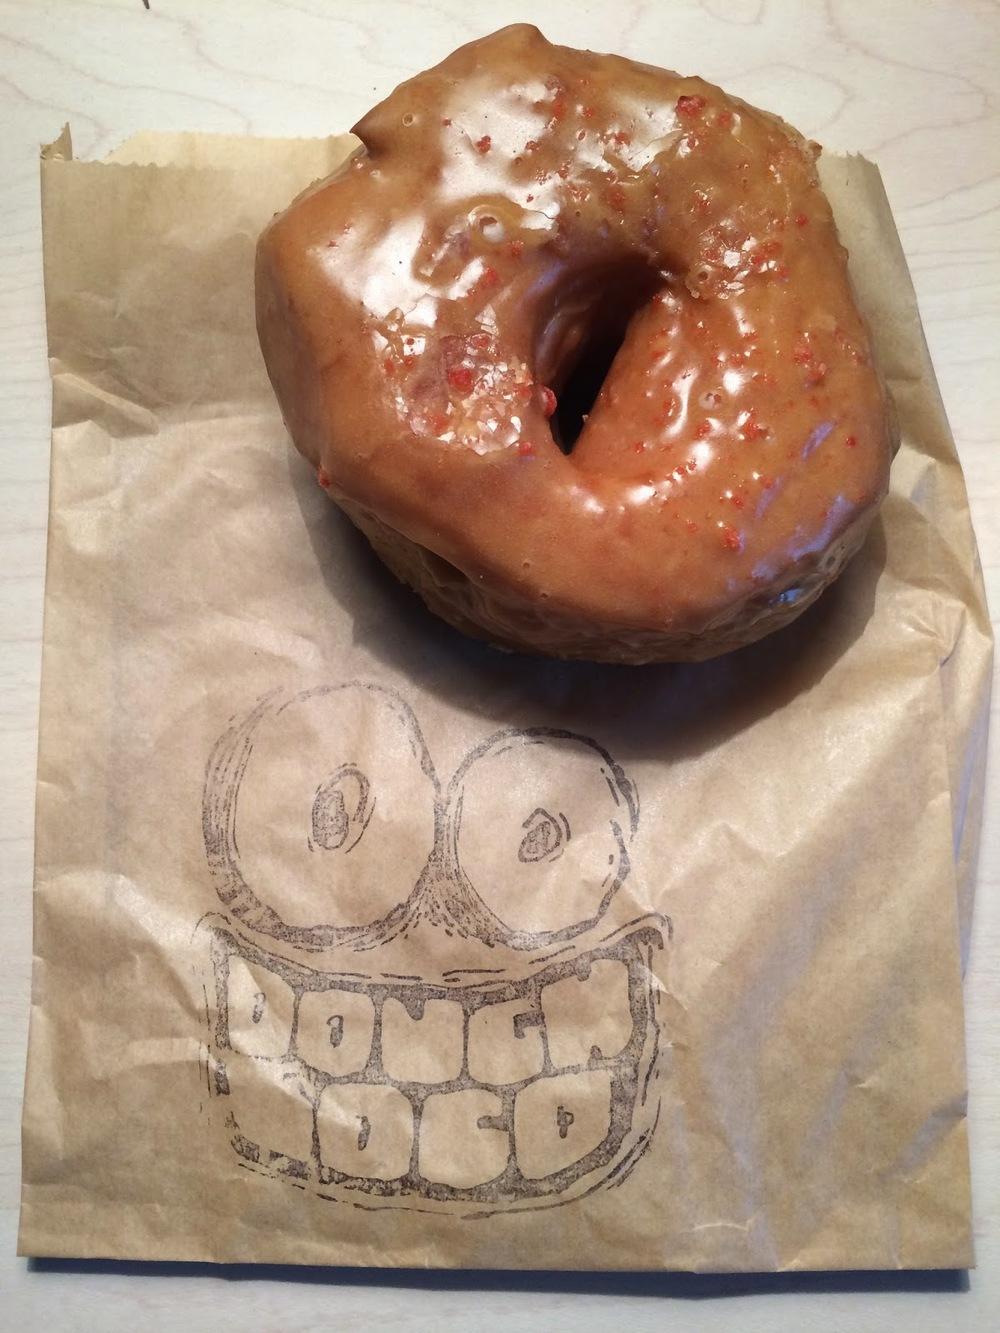 Dough Loco